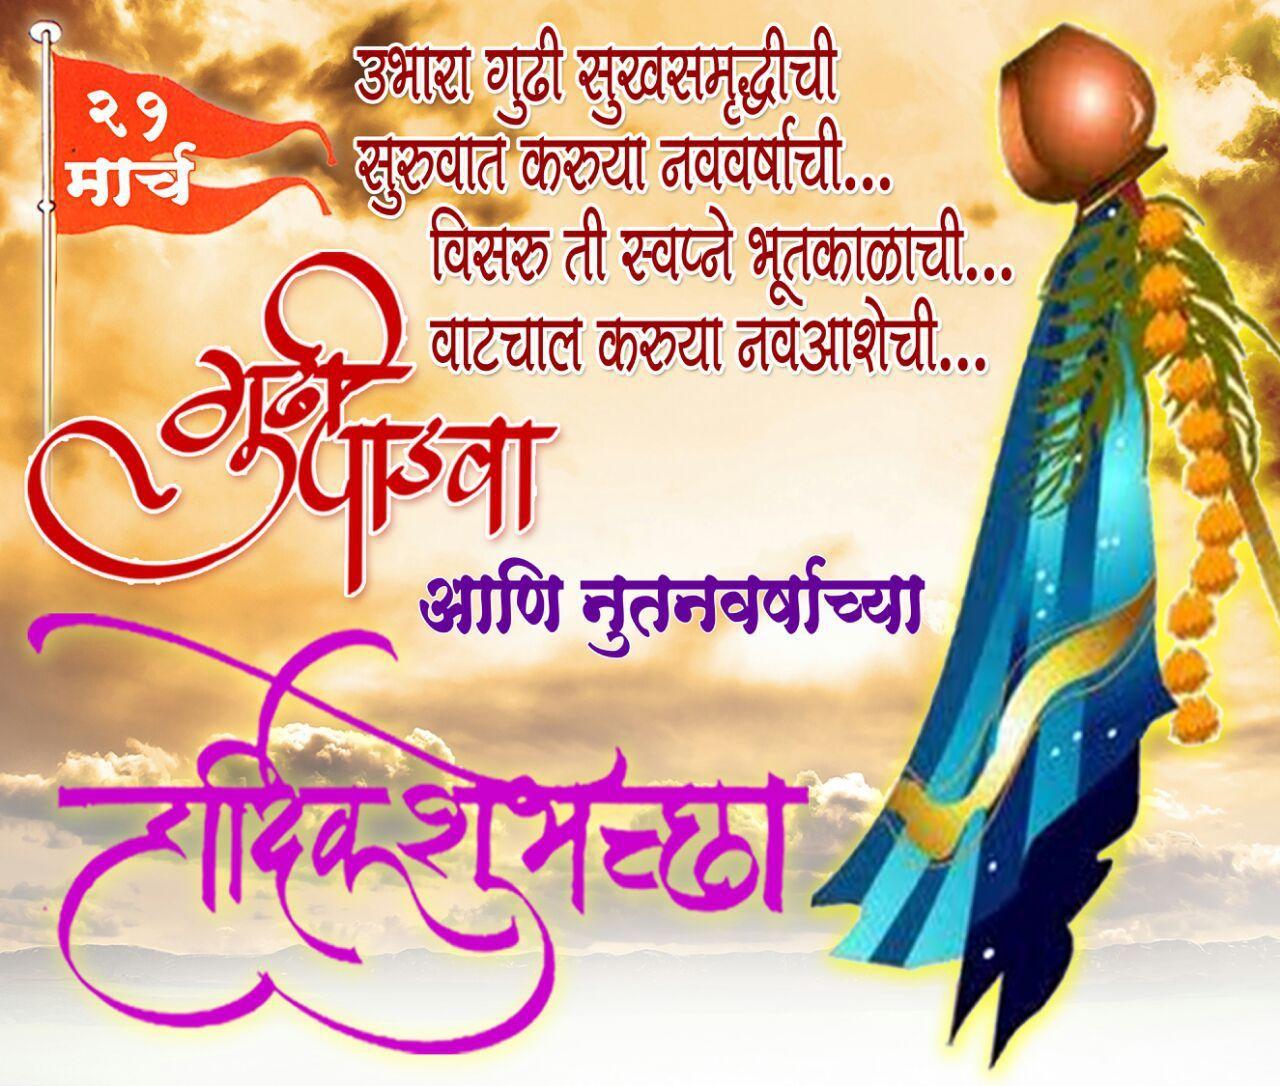 Hardik Shubhechha In Marathi   www.imgkid.com - The Image ... Vadhdivas Chya Hardik Shubhechha